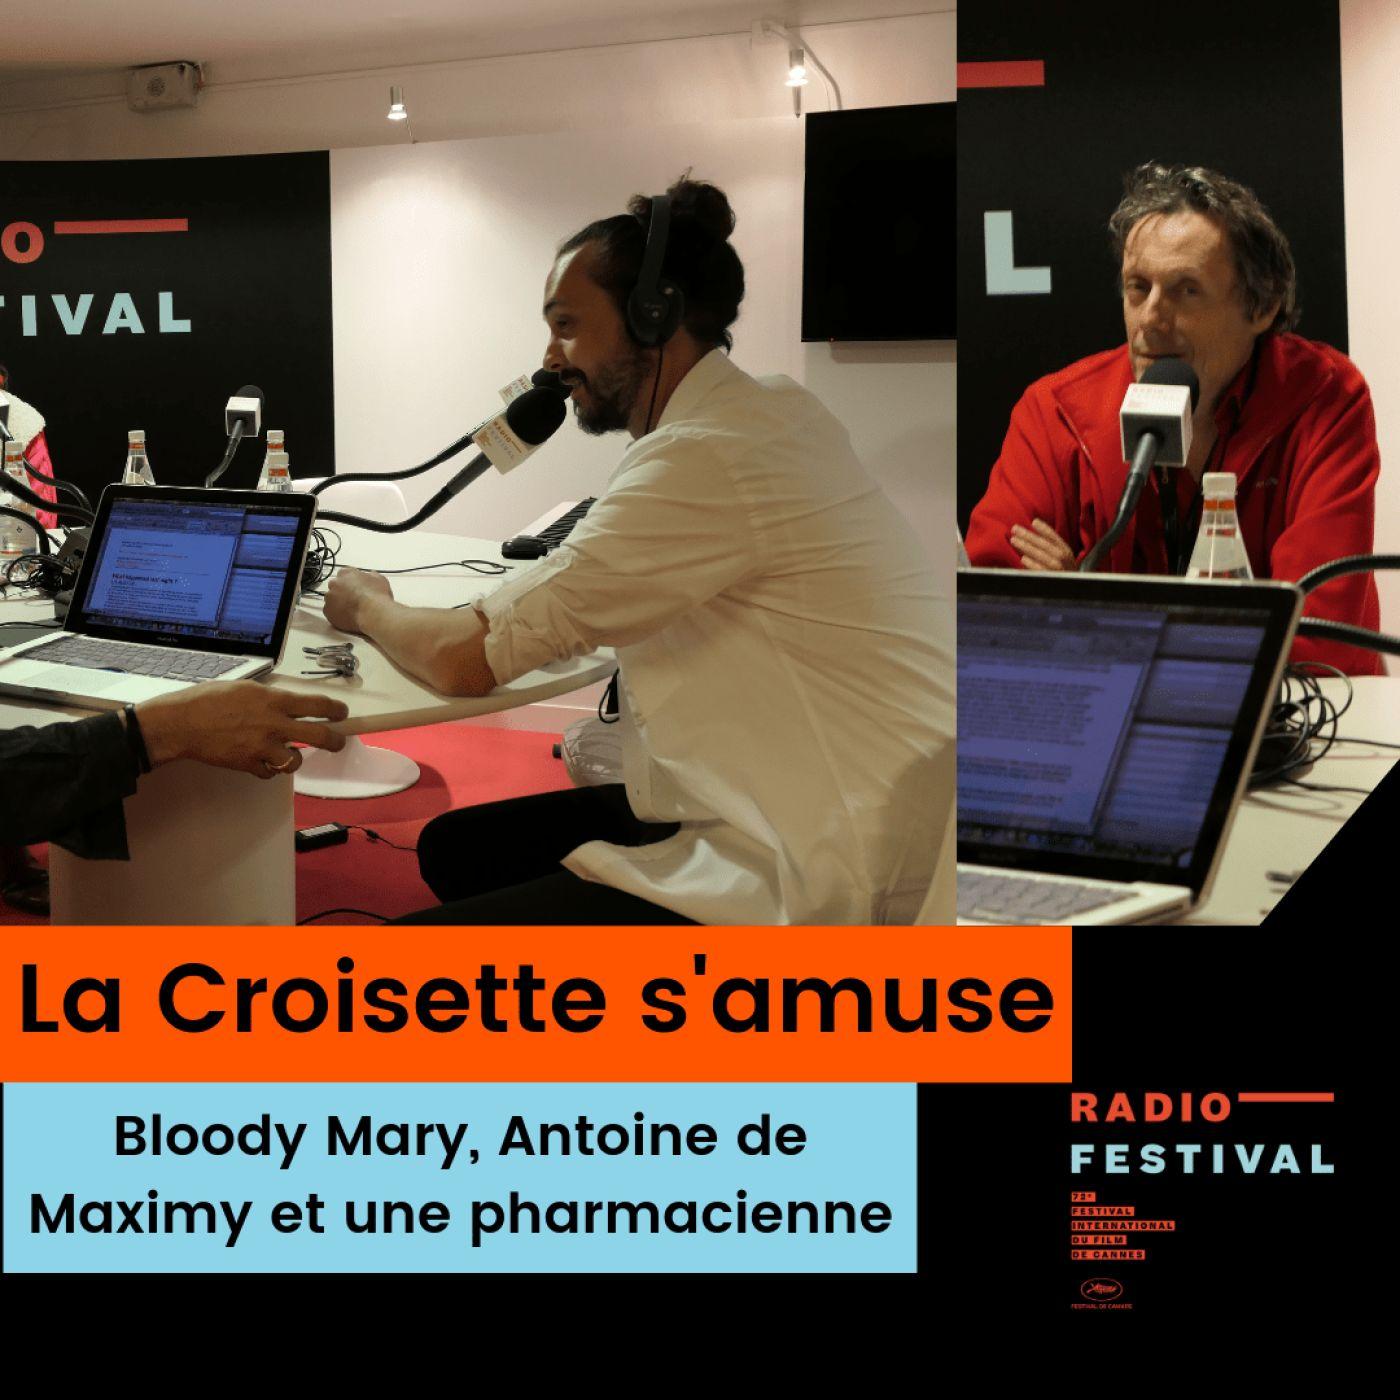 Le bloody mary, Antoine de Maximy et une pharmacienne cannoise - 17 mai 2019